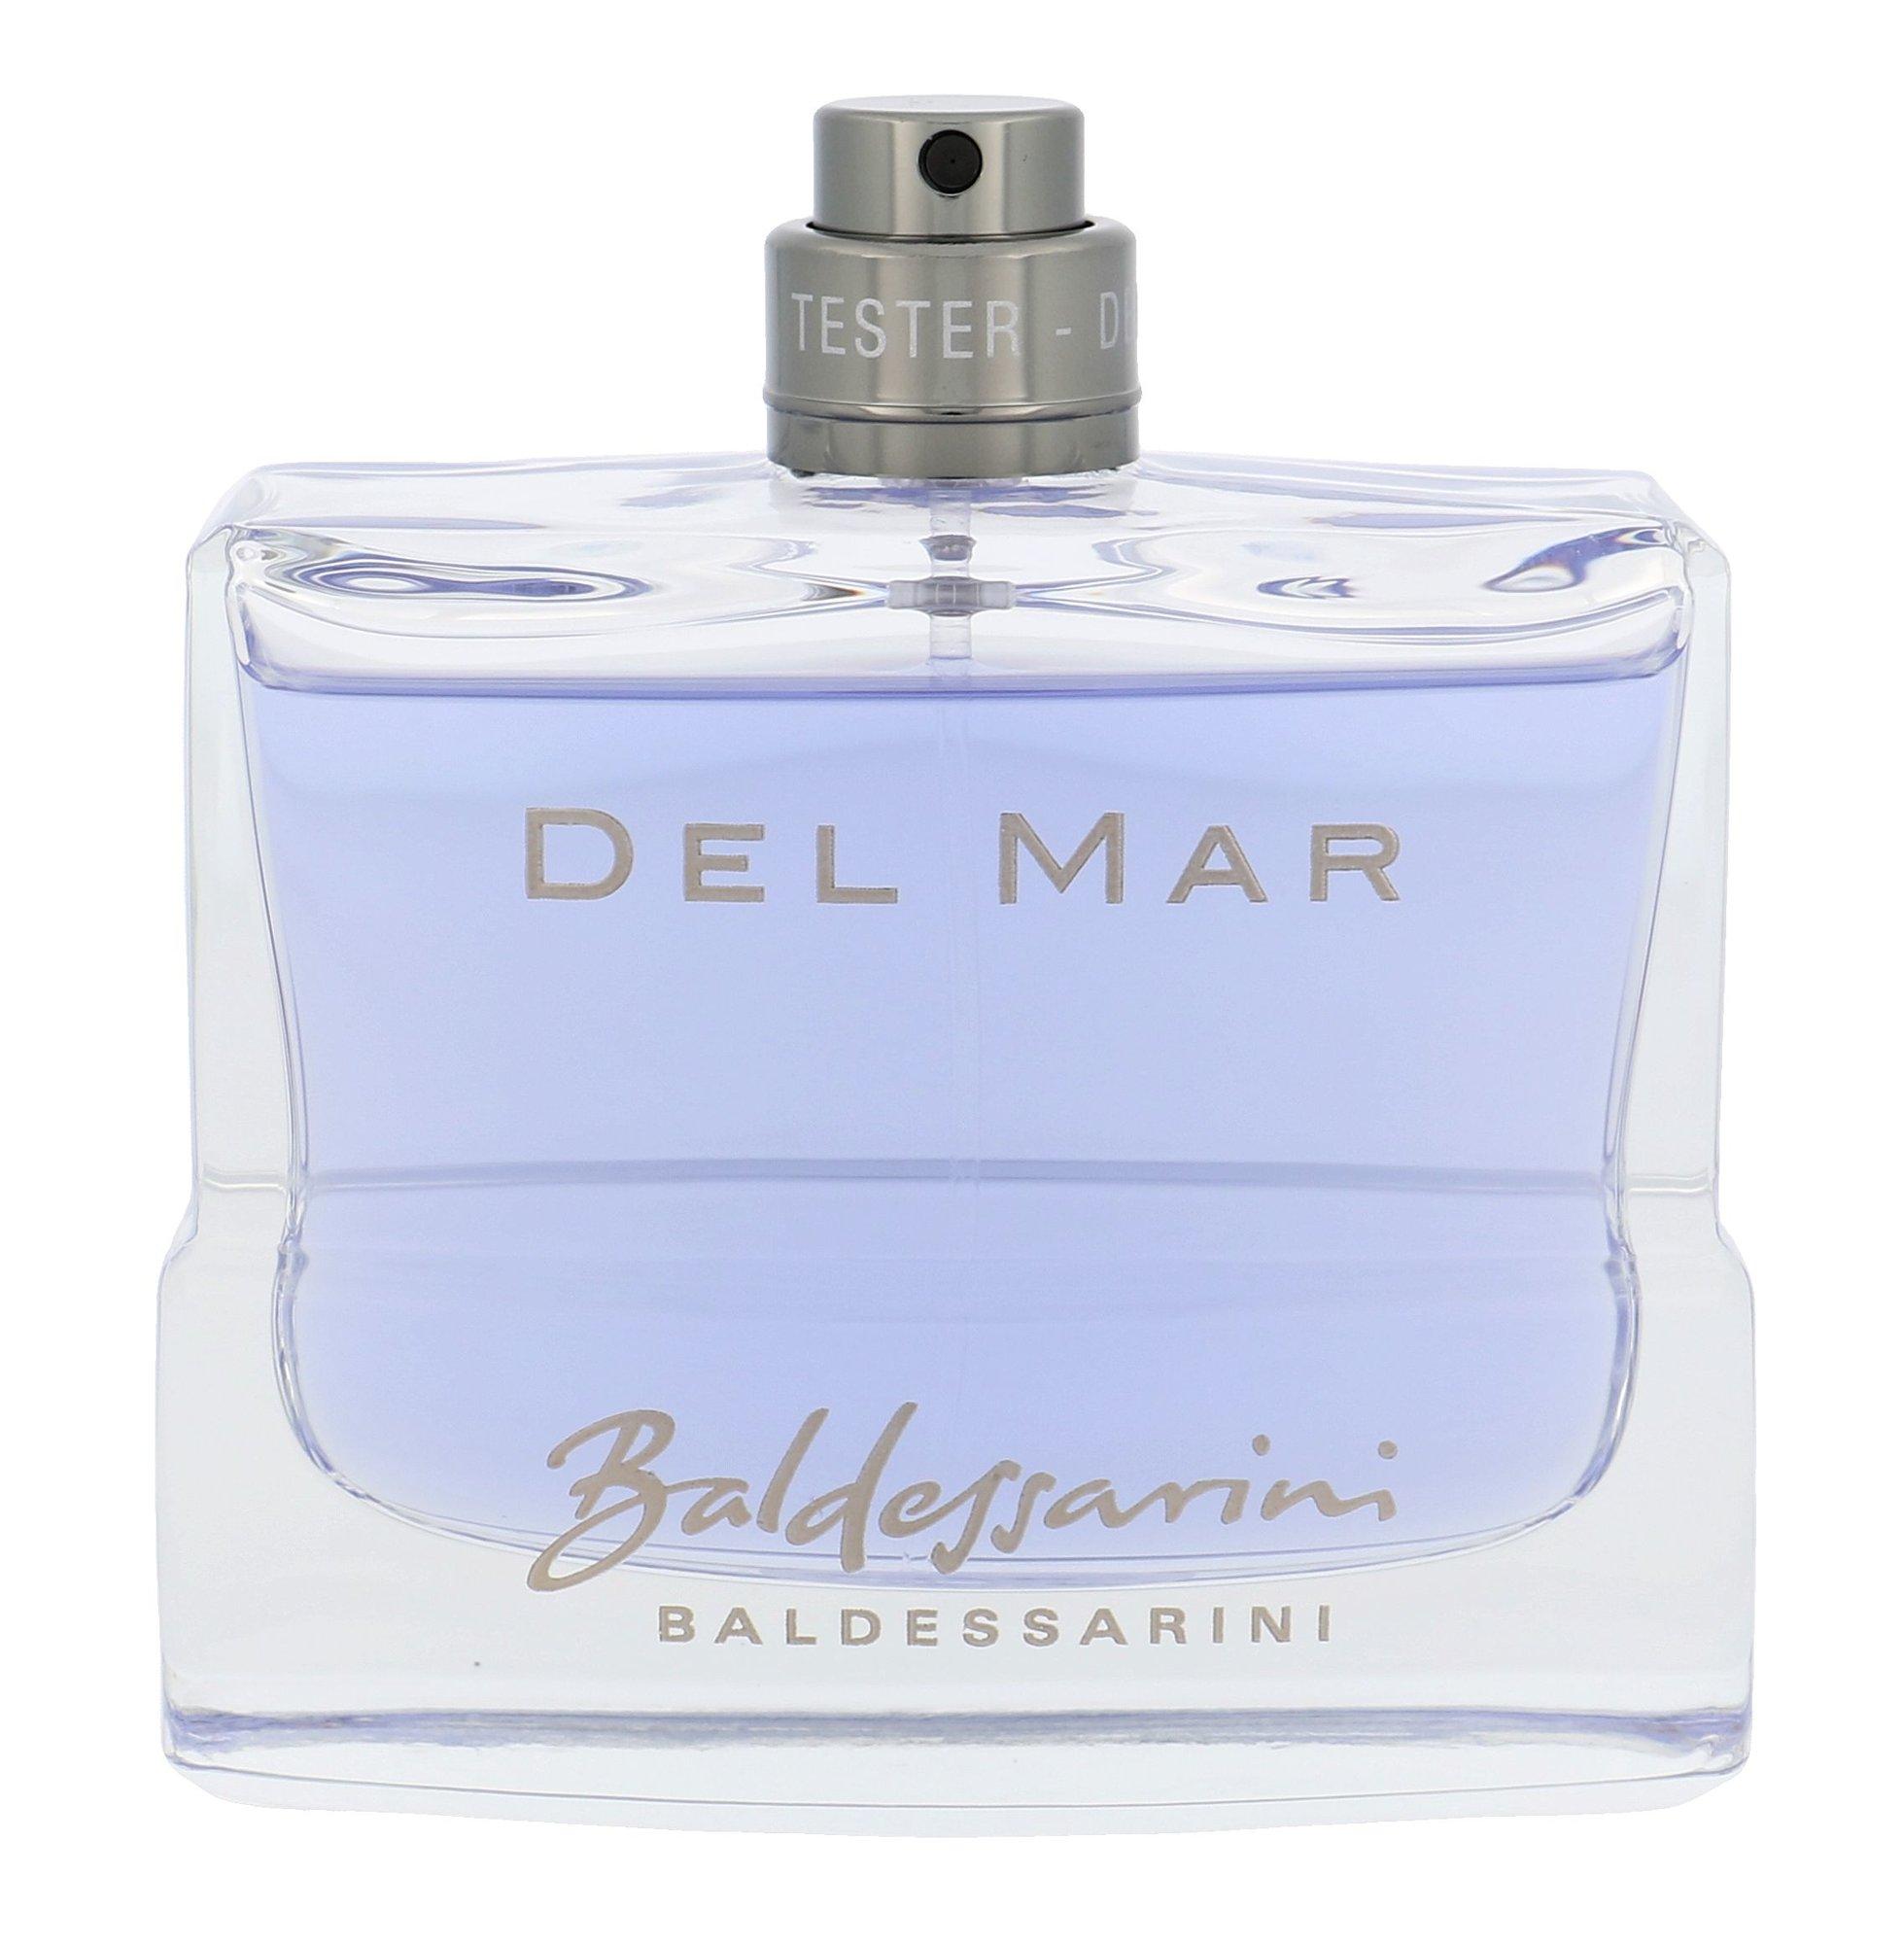 Baldessarini Del Mar, Toaletná voda 90ml, Tester